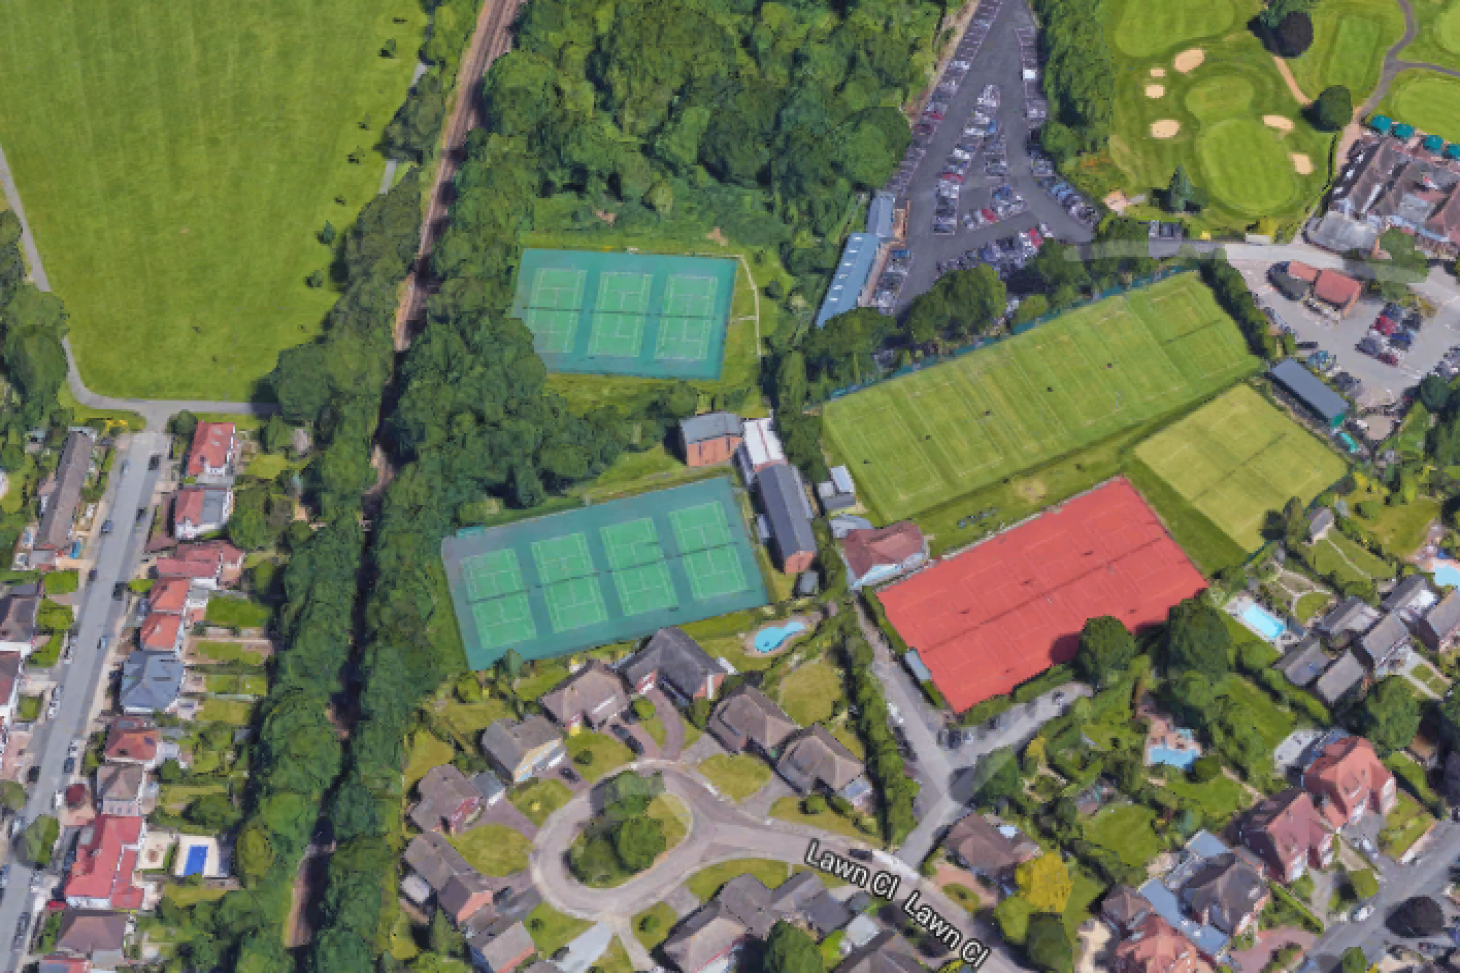 Sundridge Park Lawn Tennis & Squash Rackets Club Outdoor | Grass tennis court